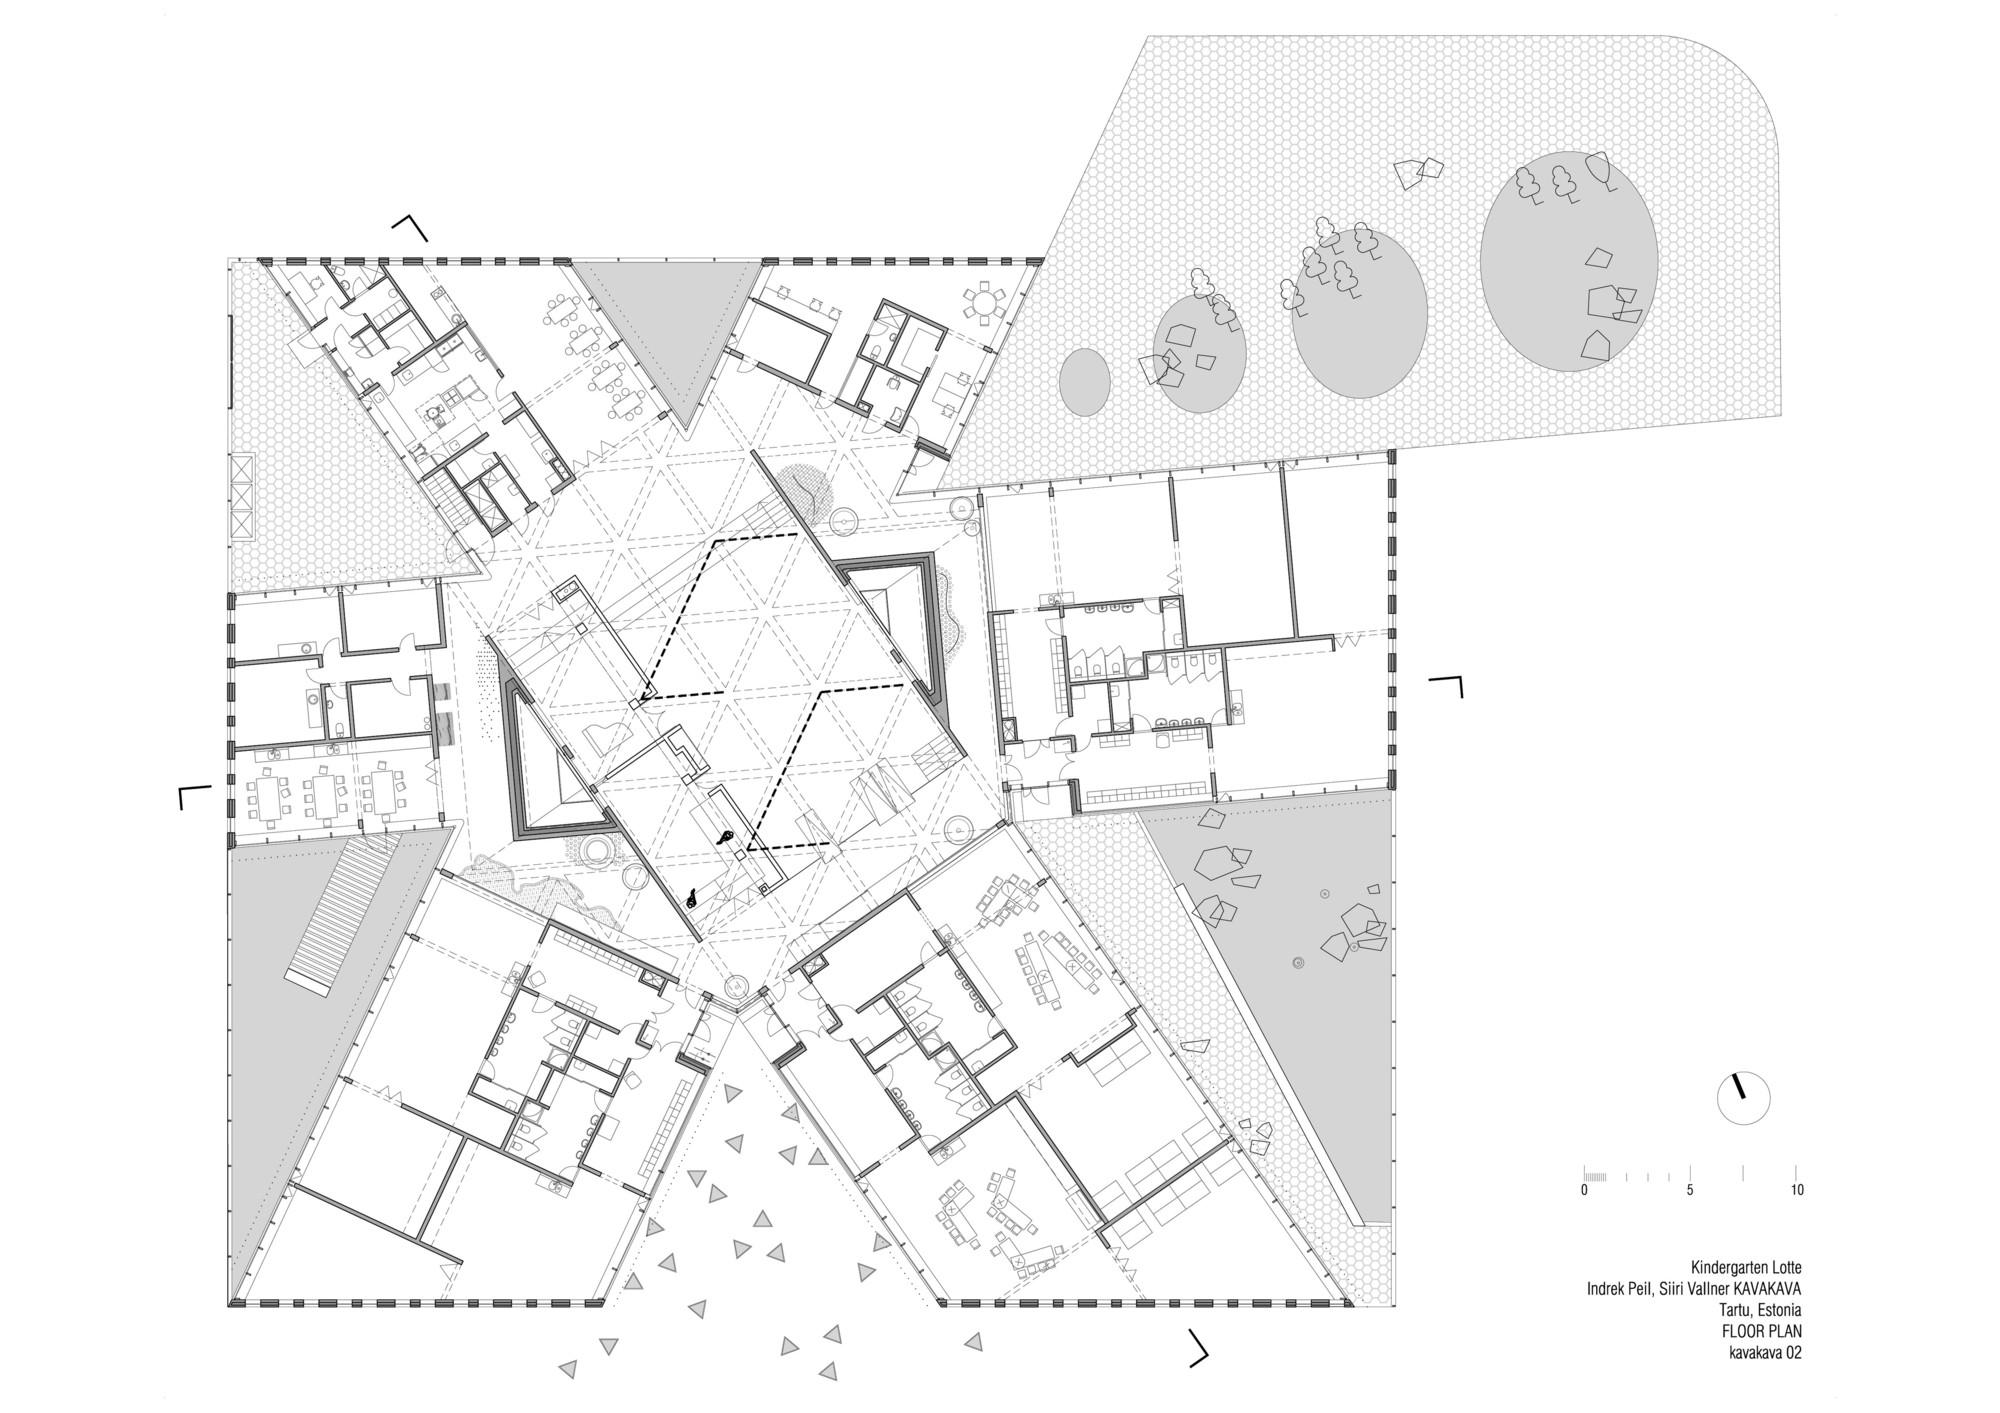 kindergarten lotte kavakava architects - Drawing Pictures For Kindergarten